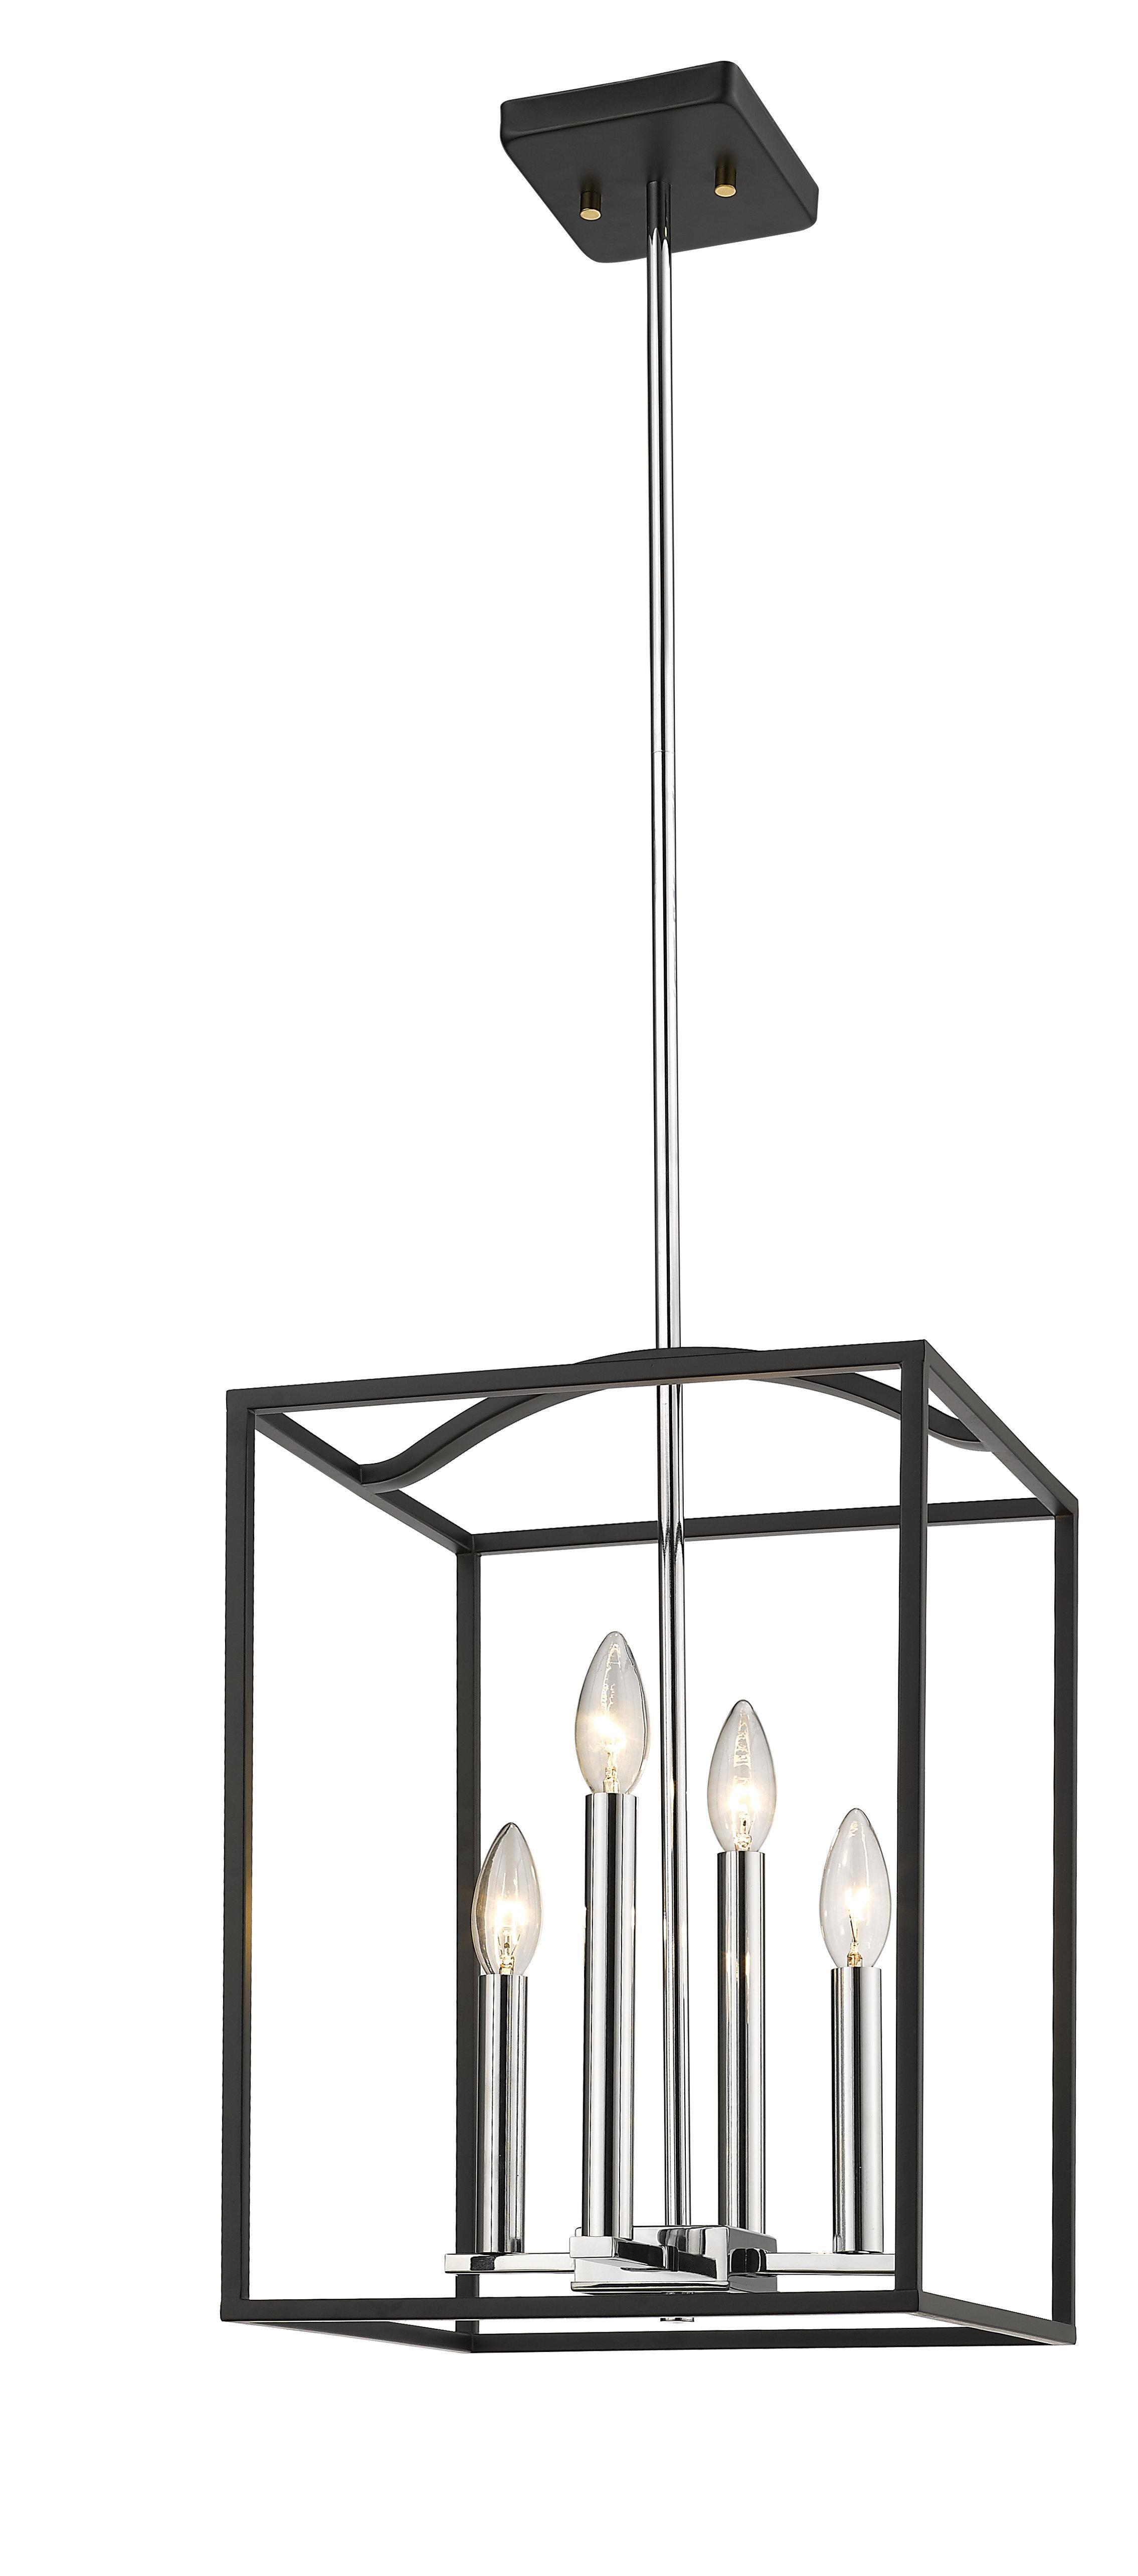 Beacsfield 4-Light Lantern Pendant with regard to Odie 4-Light Lantern Square Pendants (Image 4 of 30)